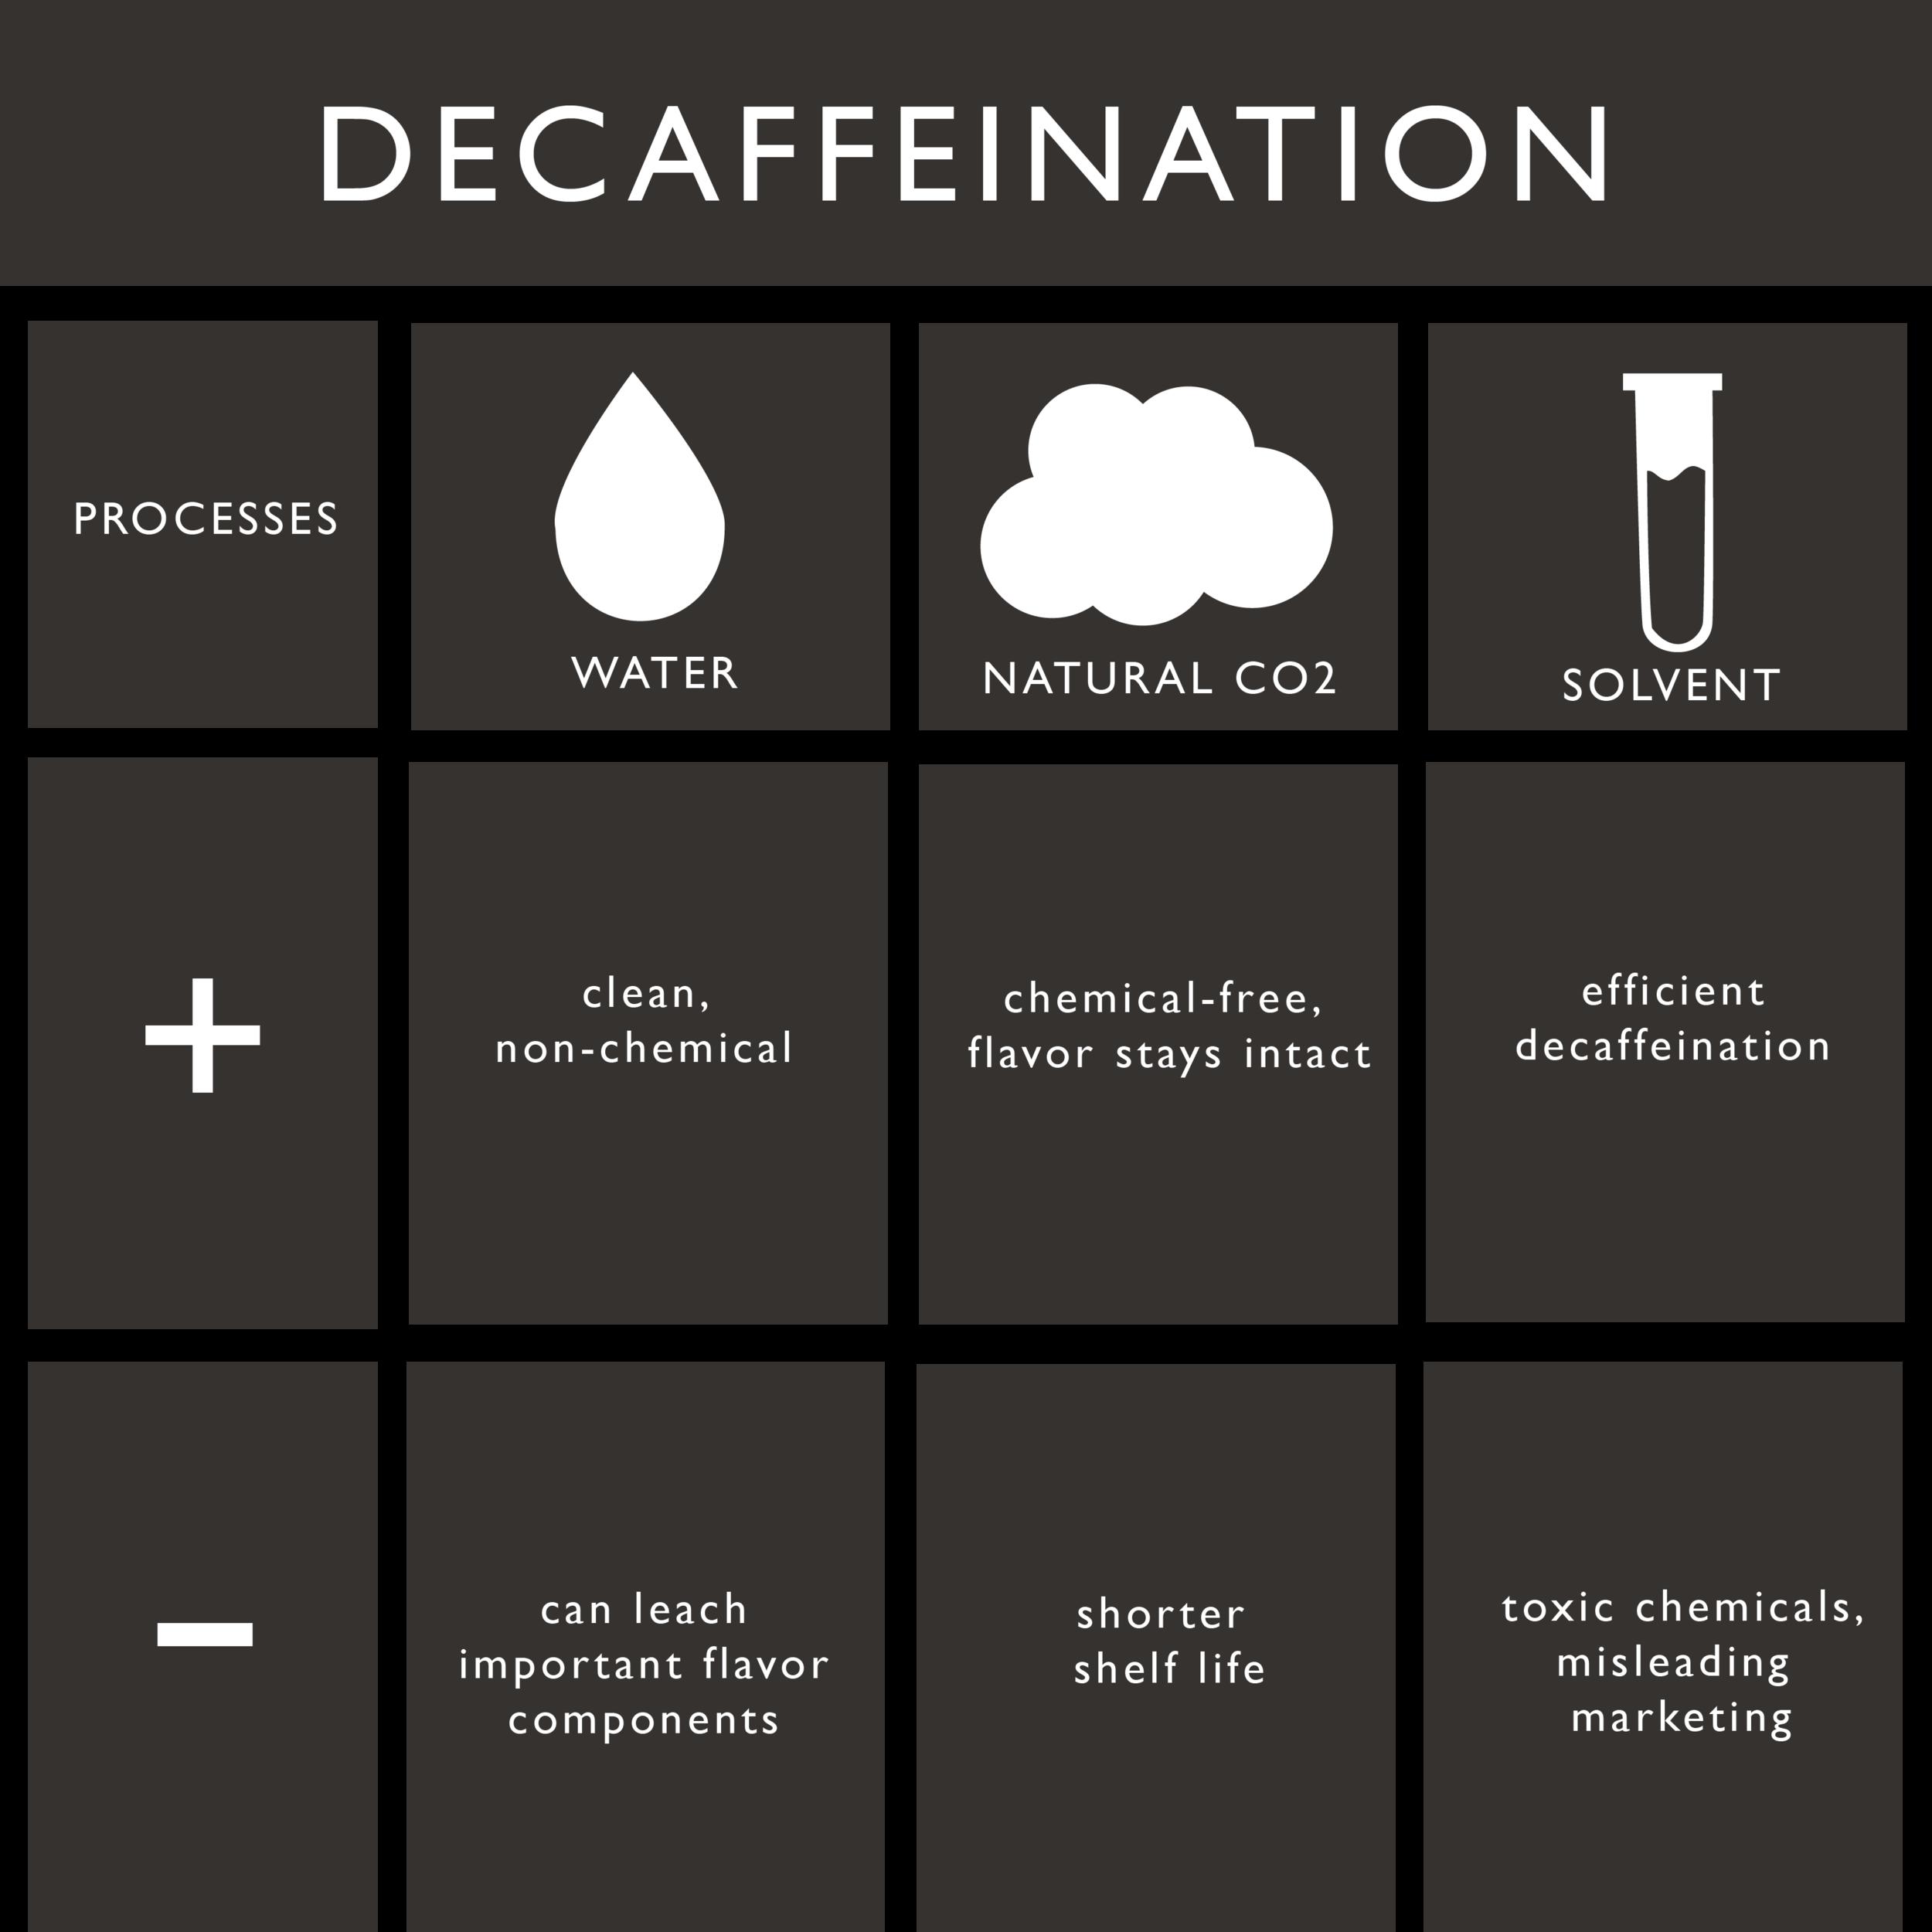 Decaffination processes charrt-01.png